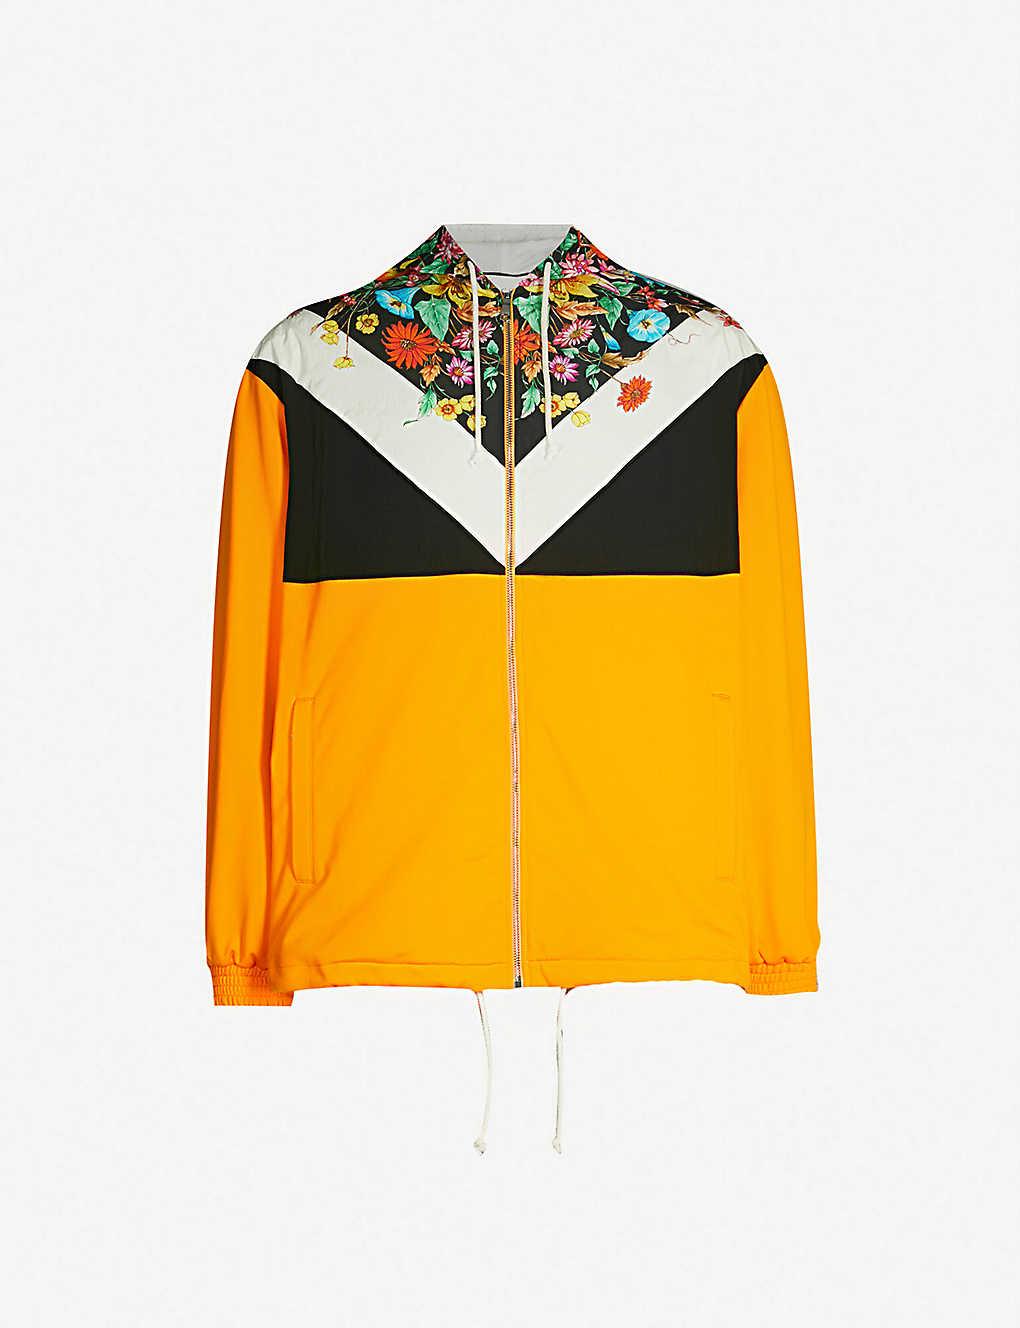 d938bac42 GUCCI - Floral-print shell hooded jacket | Selfridges.com